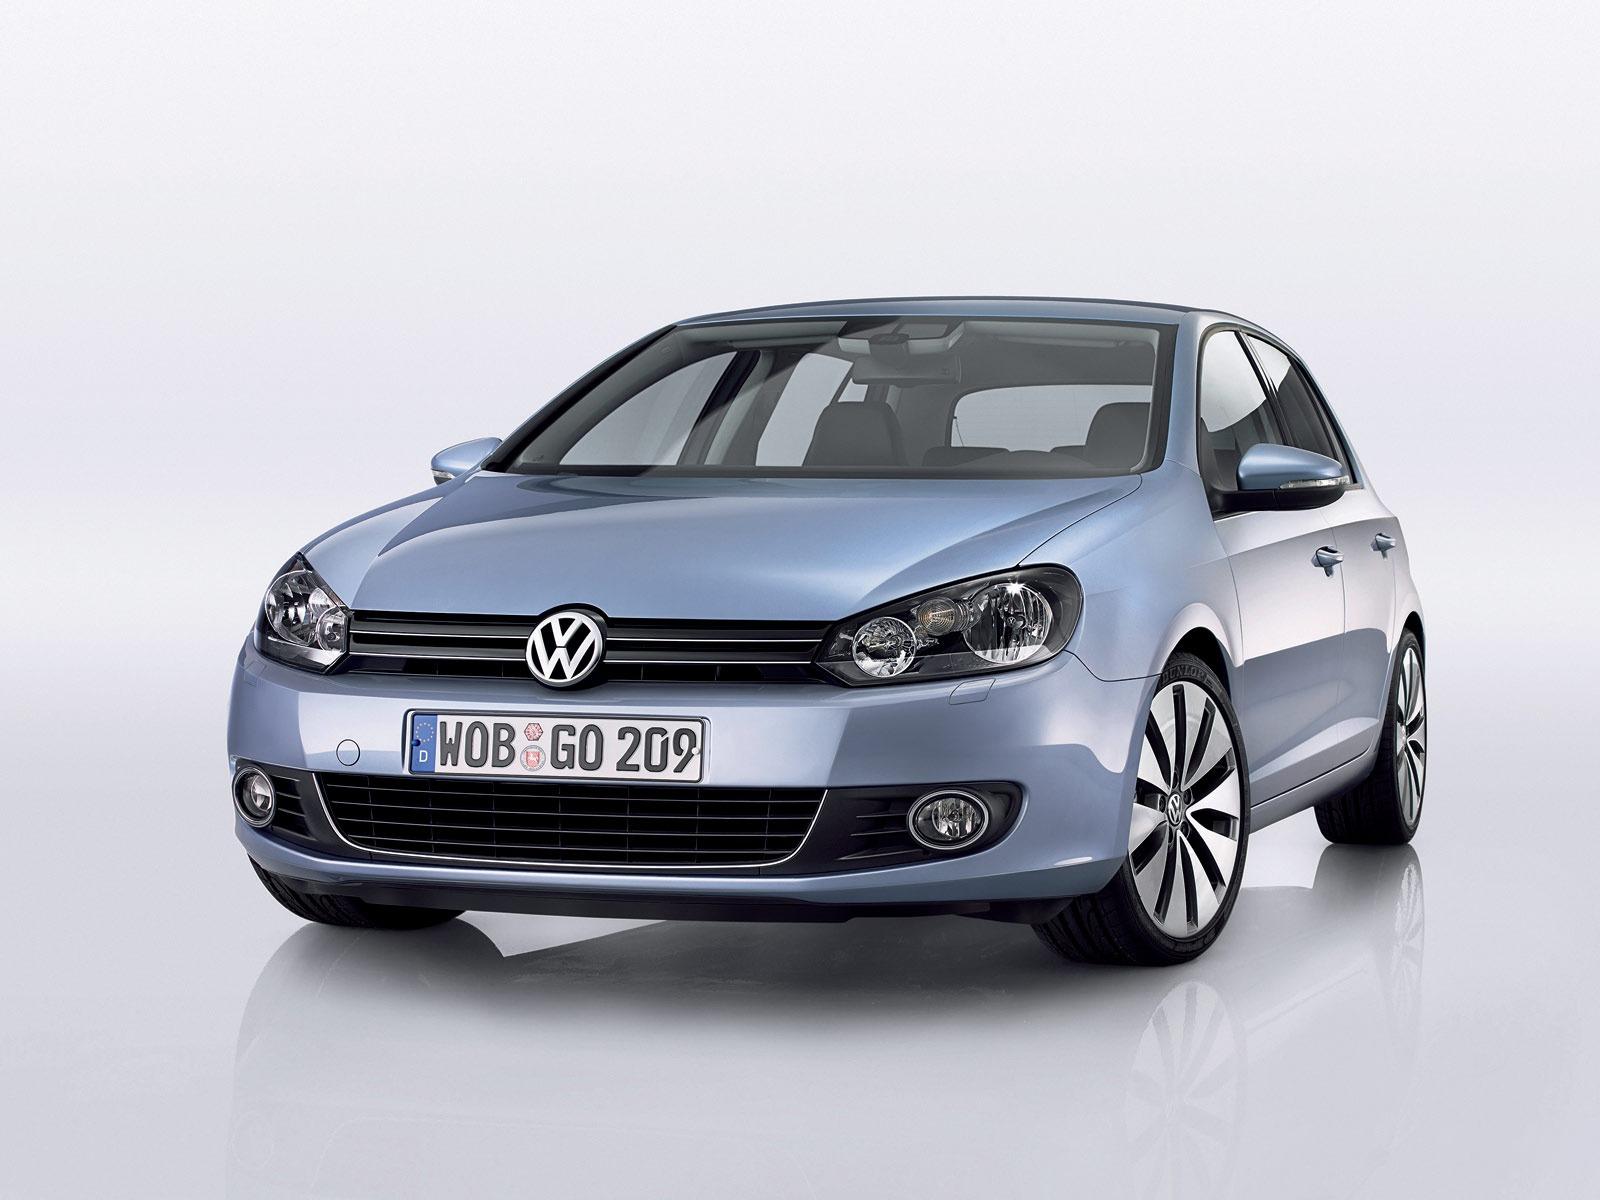 vw golf vi wallpaper volkswagen cars wallpaper 1600 1200 2352jpg 1600x1200